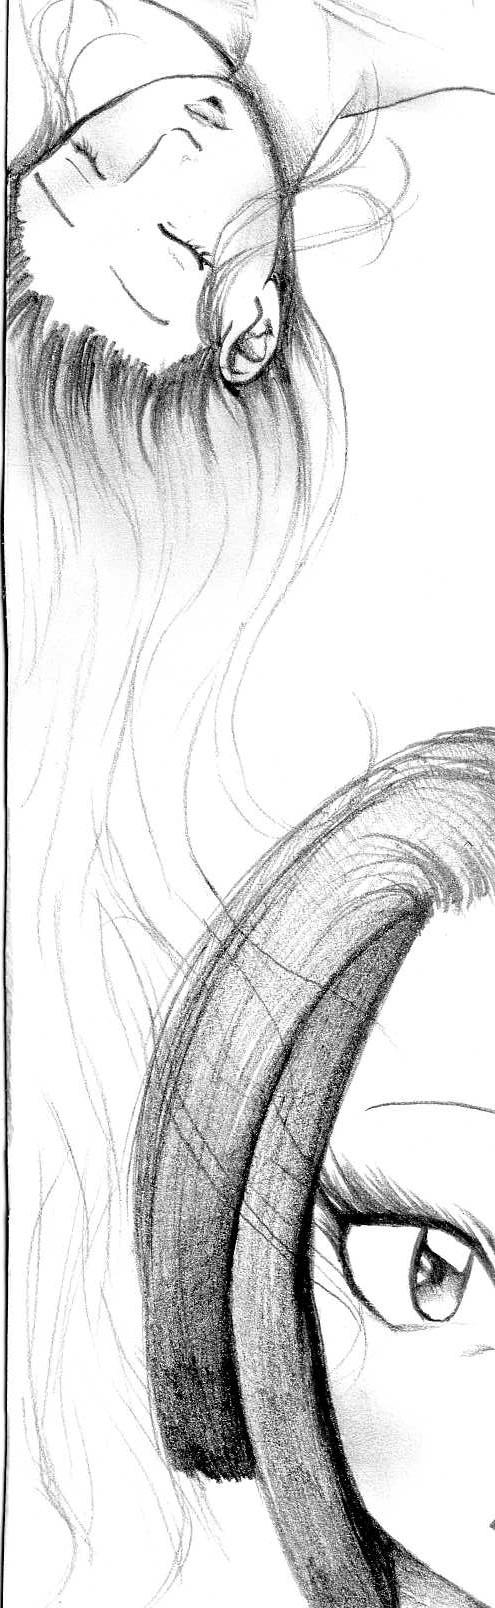 sesja lato 2010 doodles by NanakoHarrison